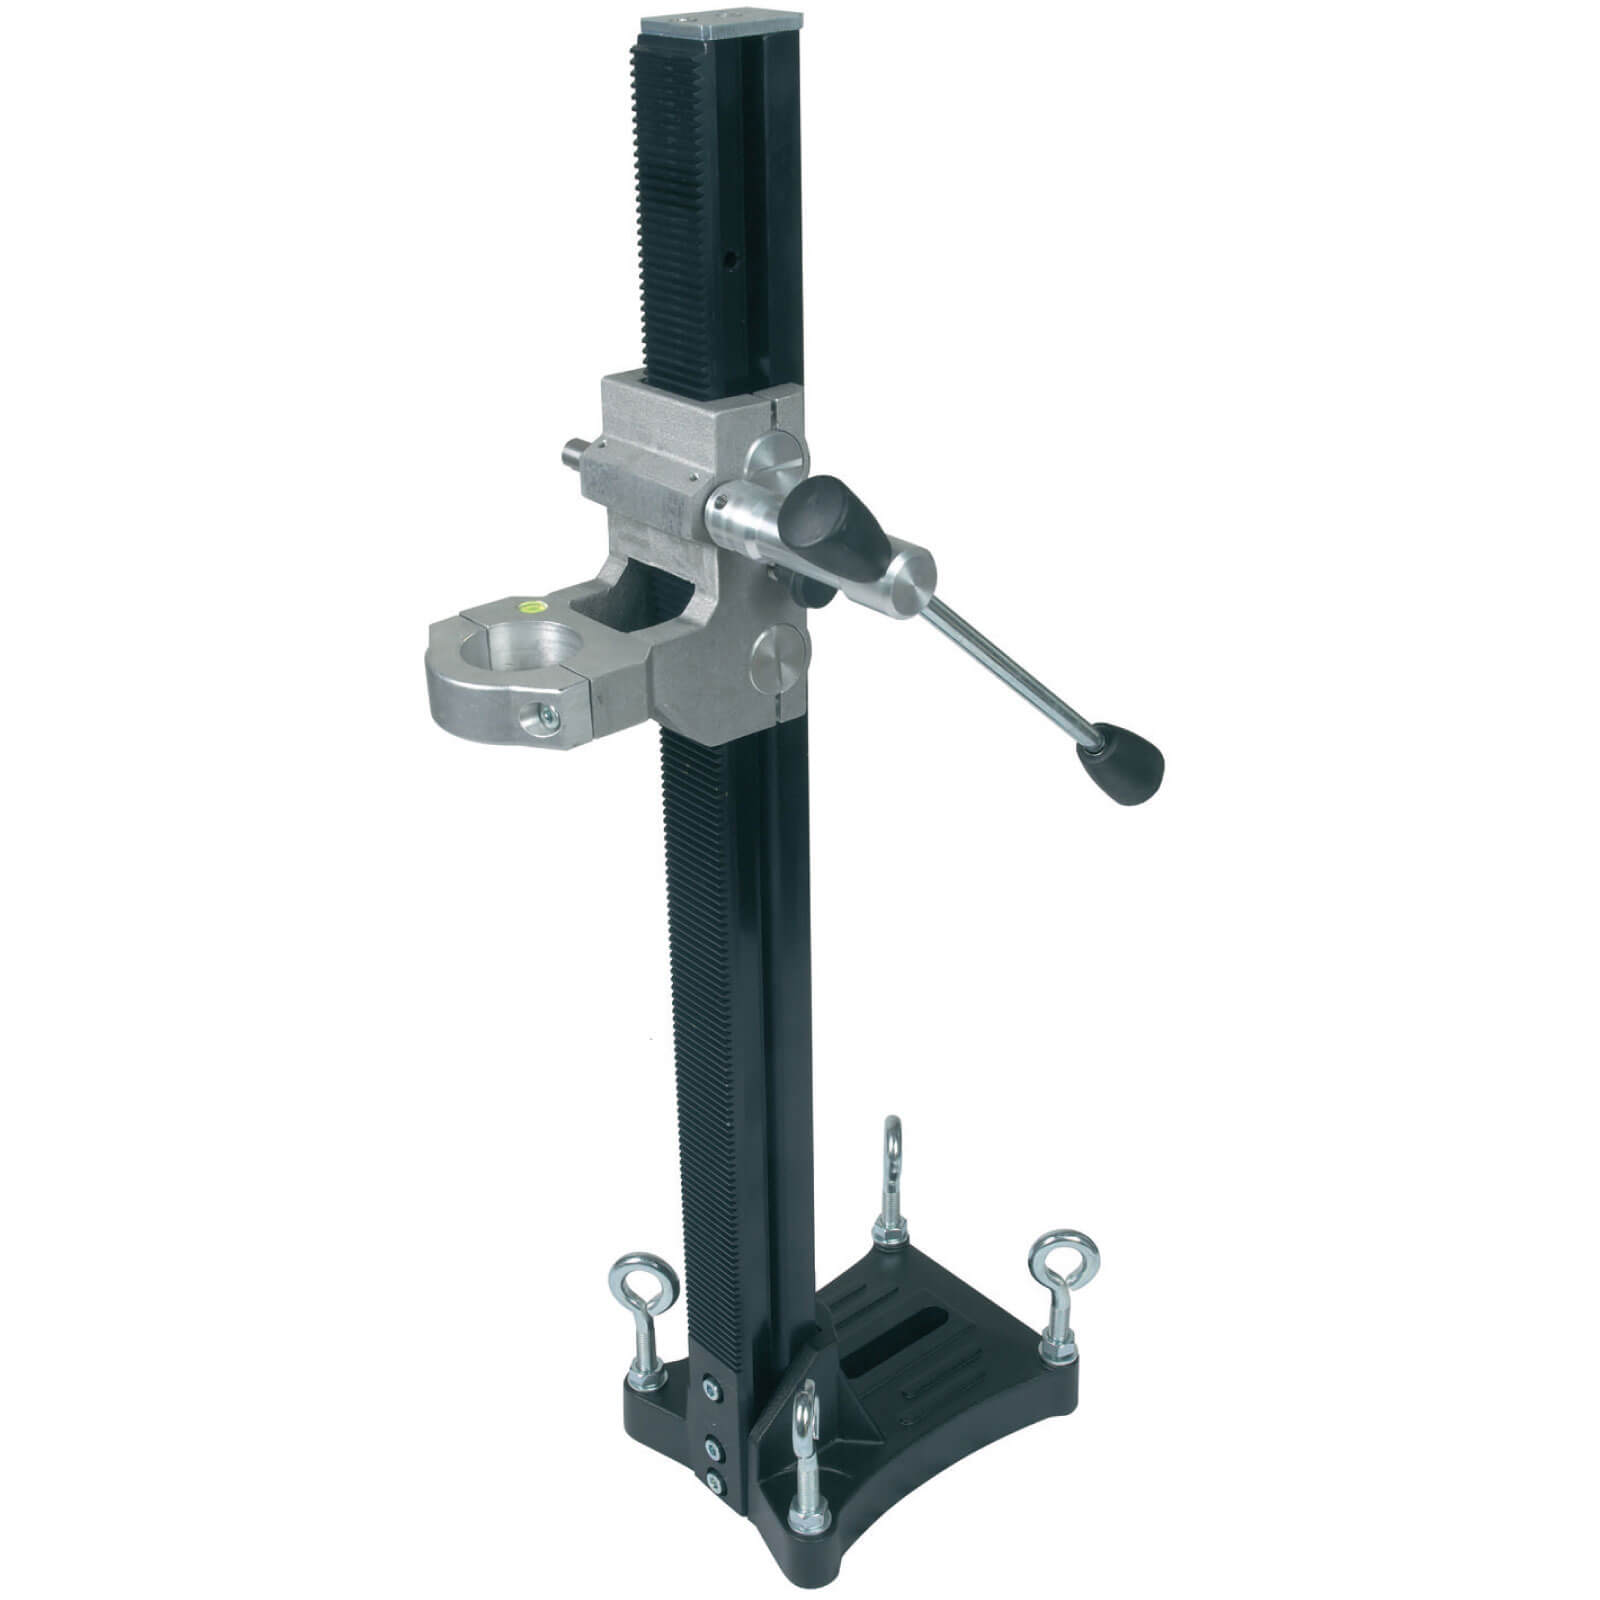 Image of DeWalt Diamond Drill Stand